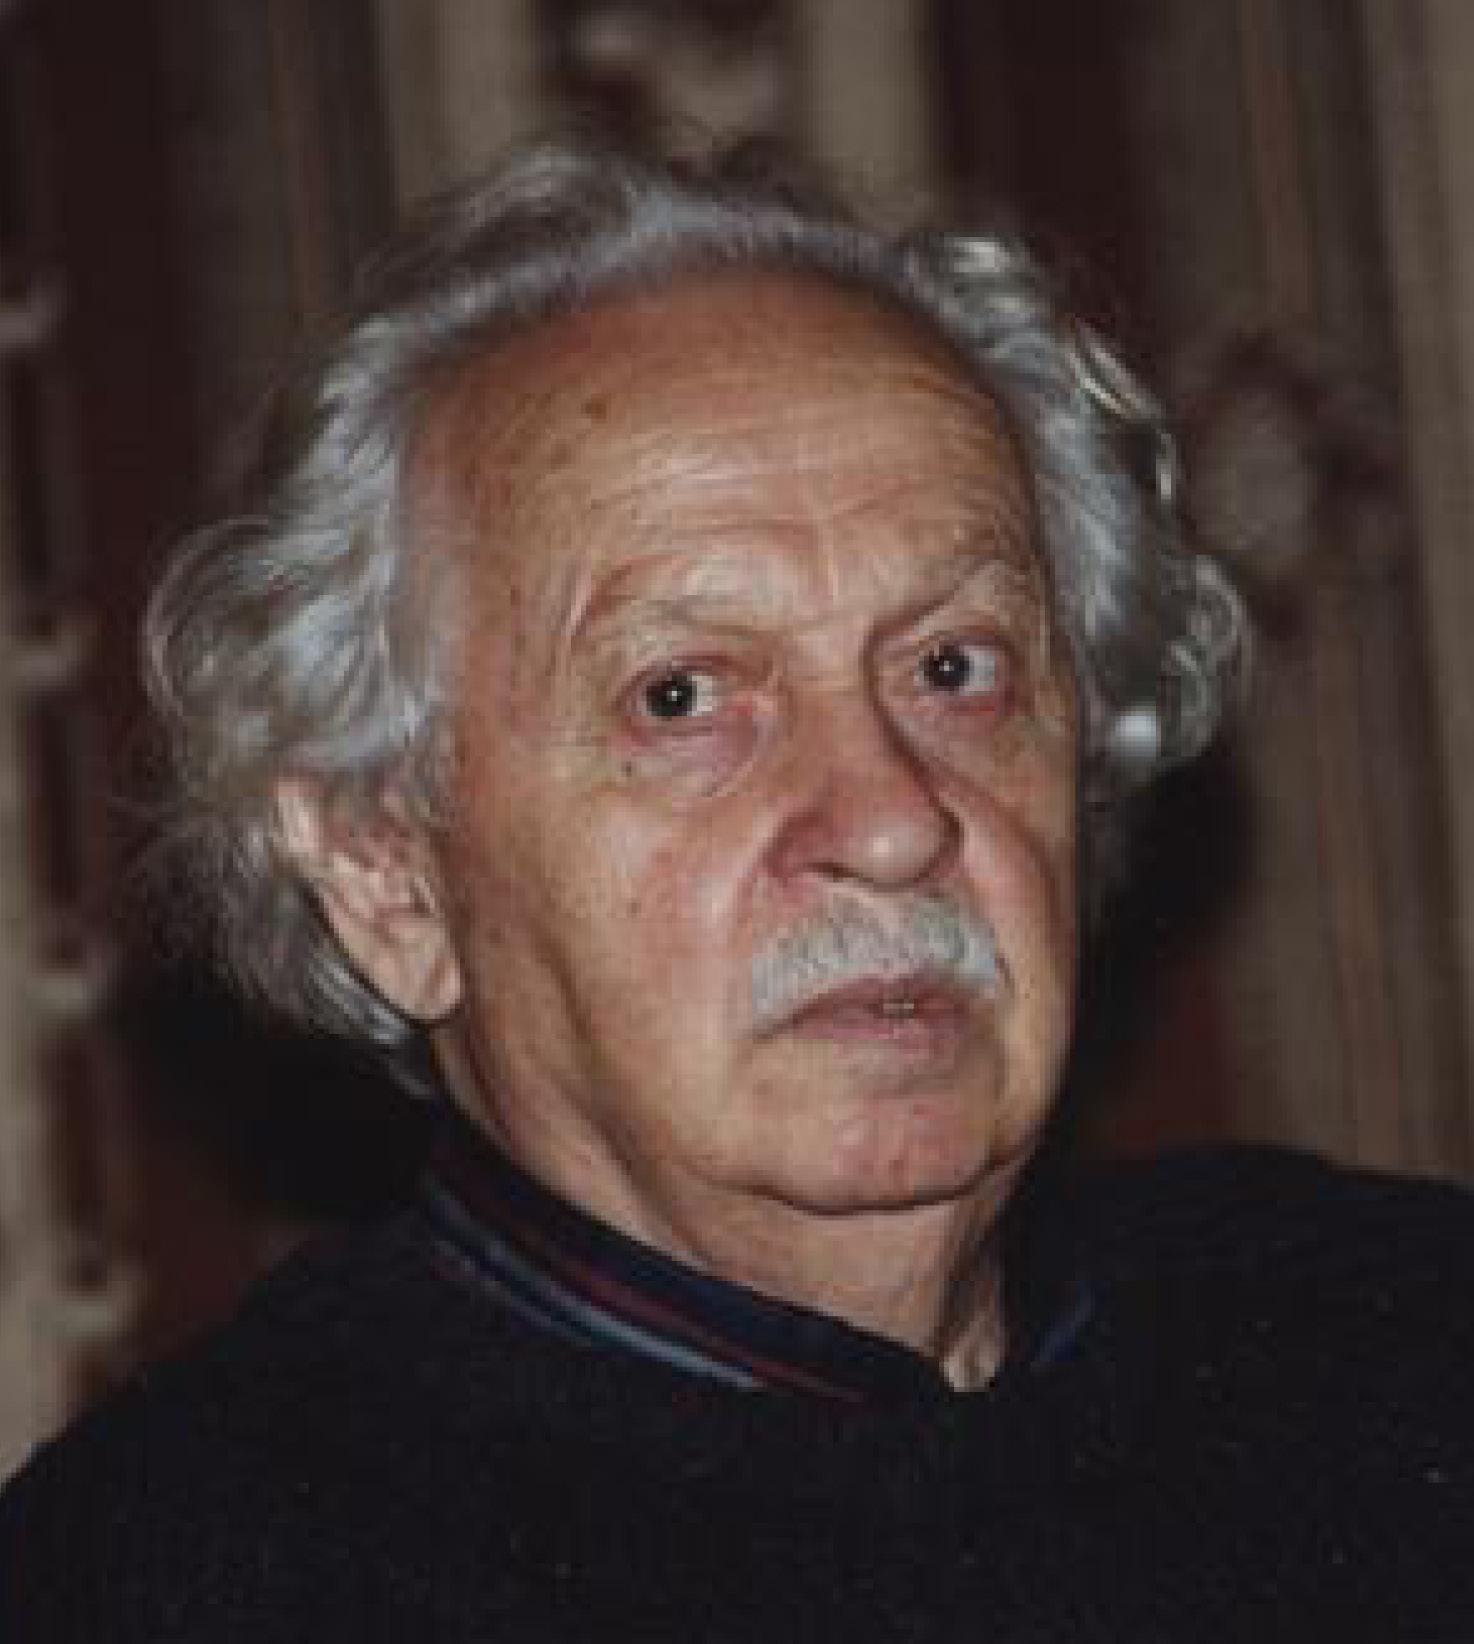 Alexander Borschagovsky